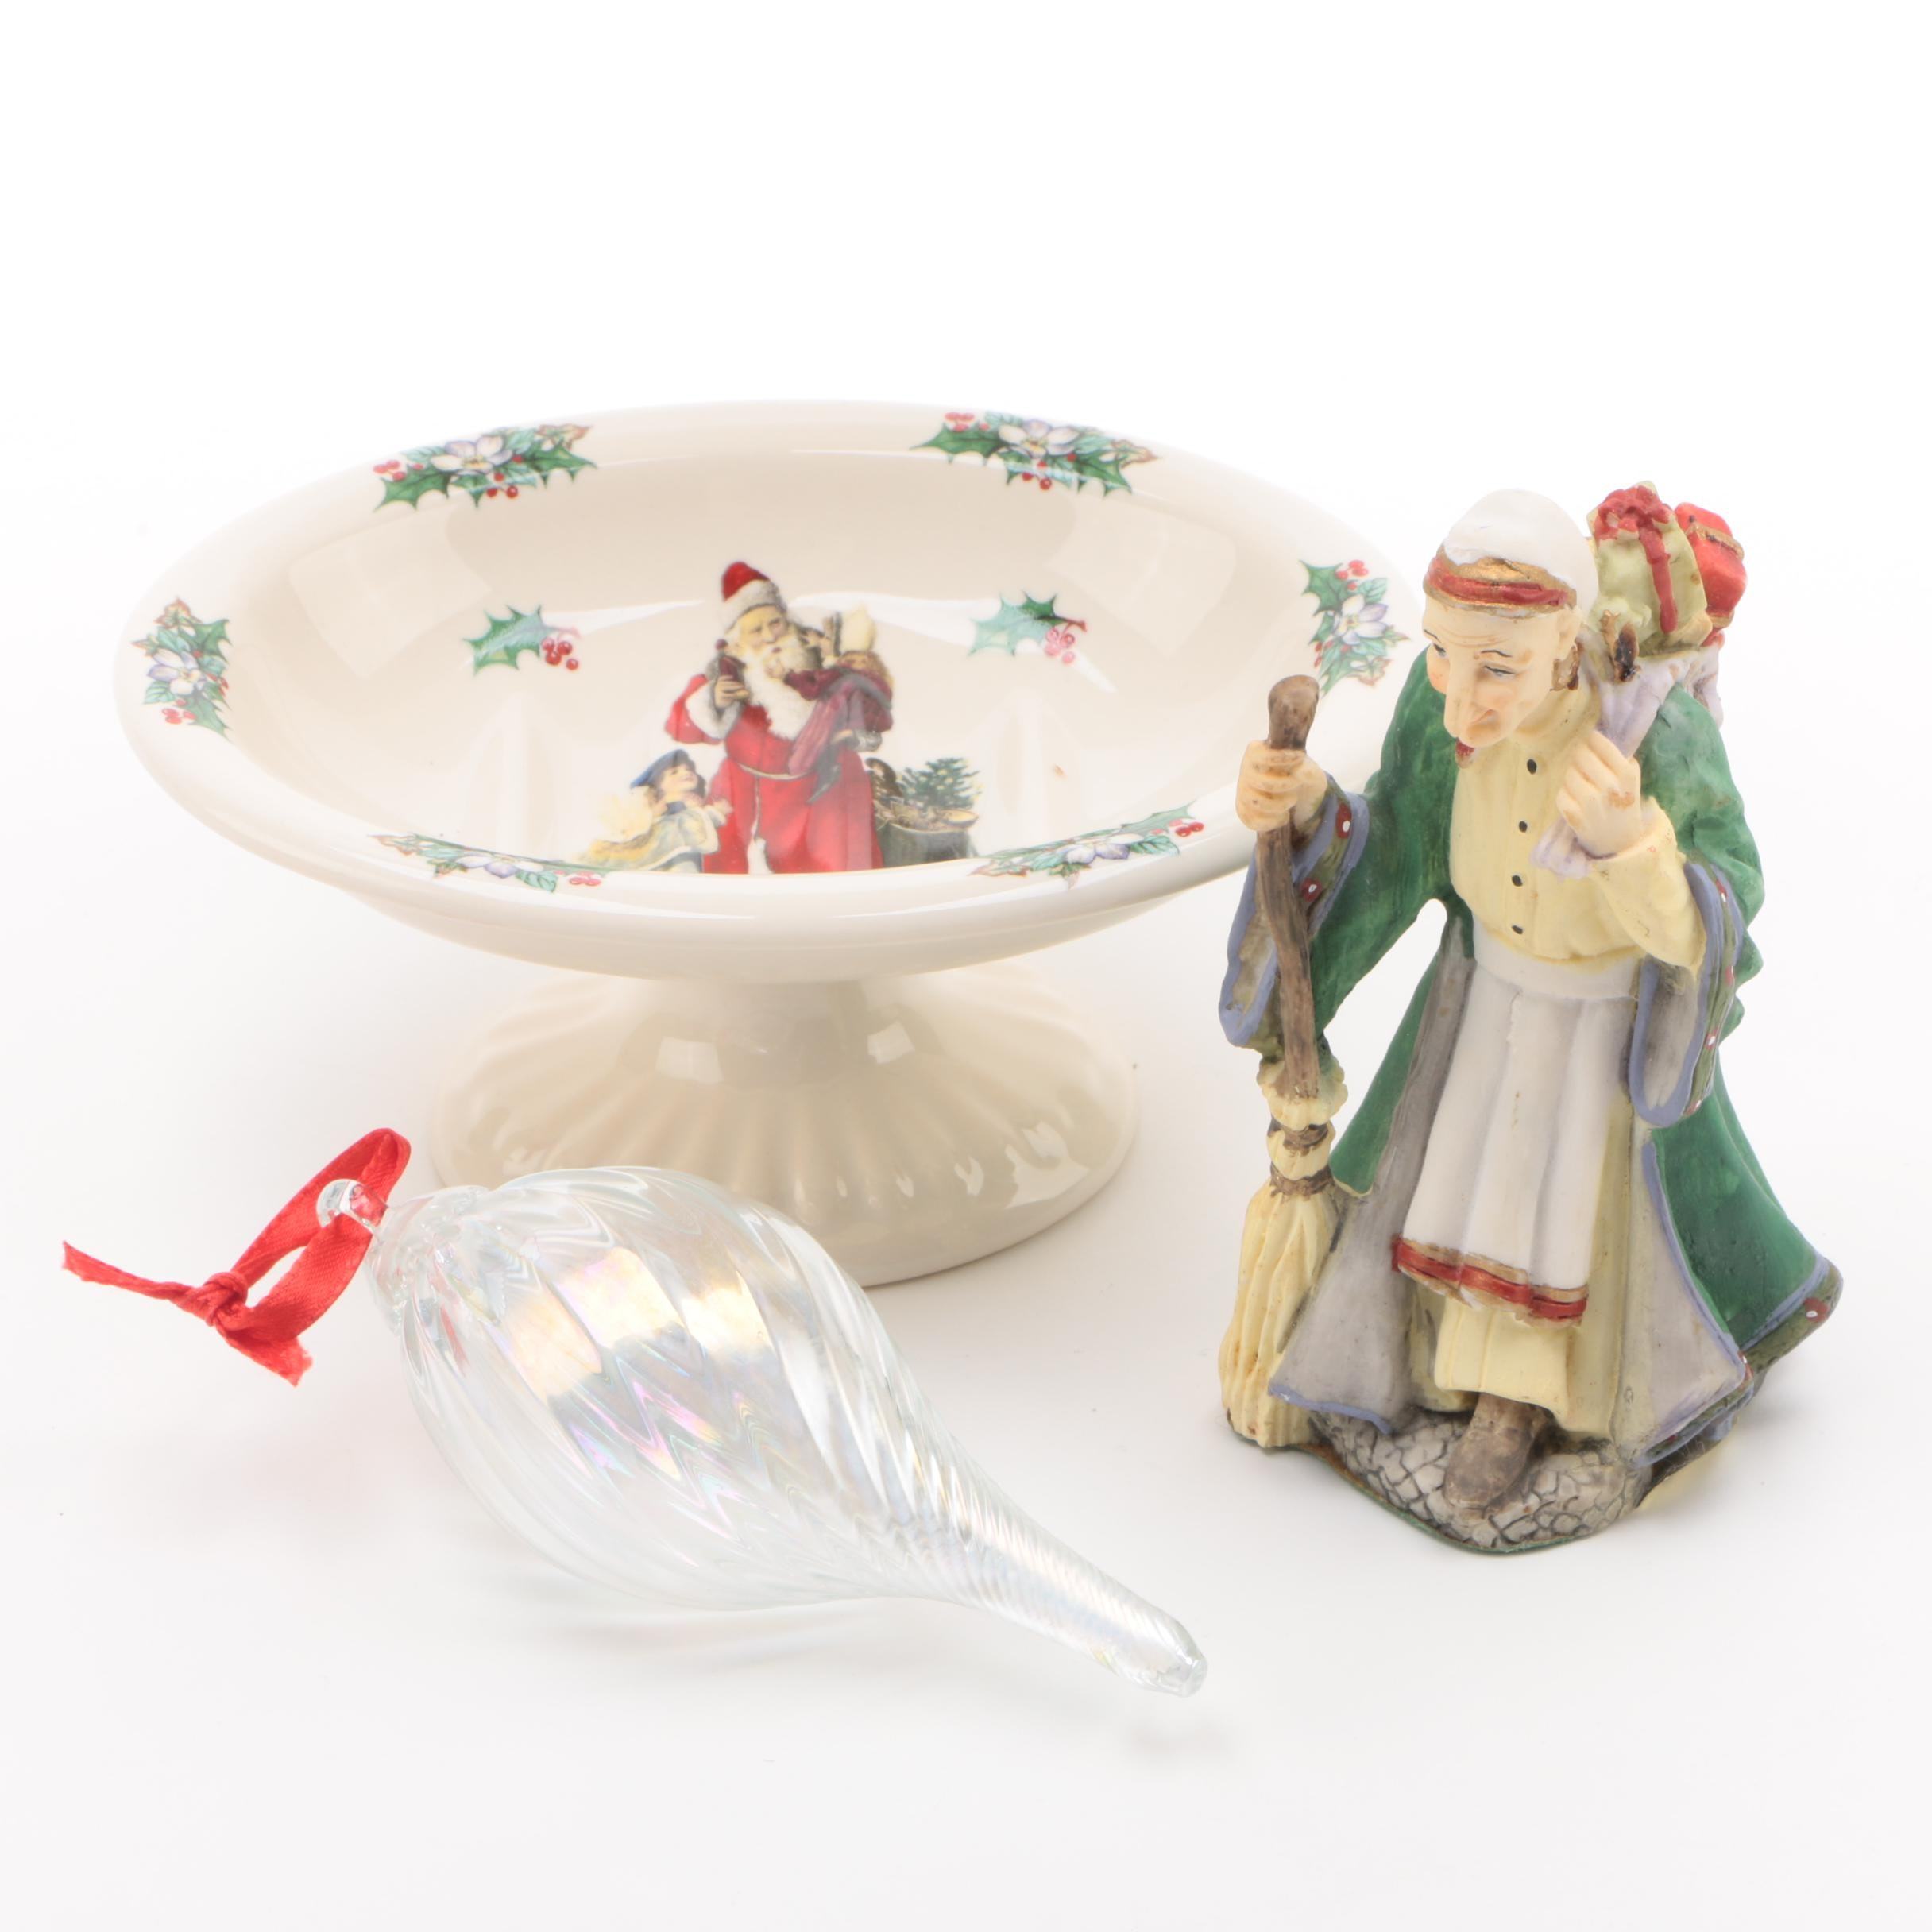 """La Befana"" Porcelain Figurine and Other Christmas Decor"